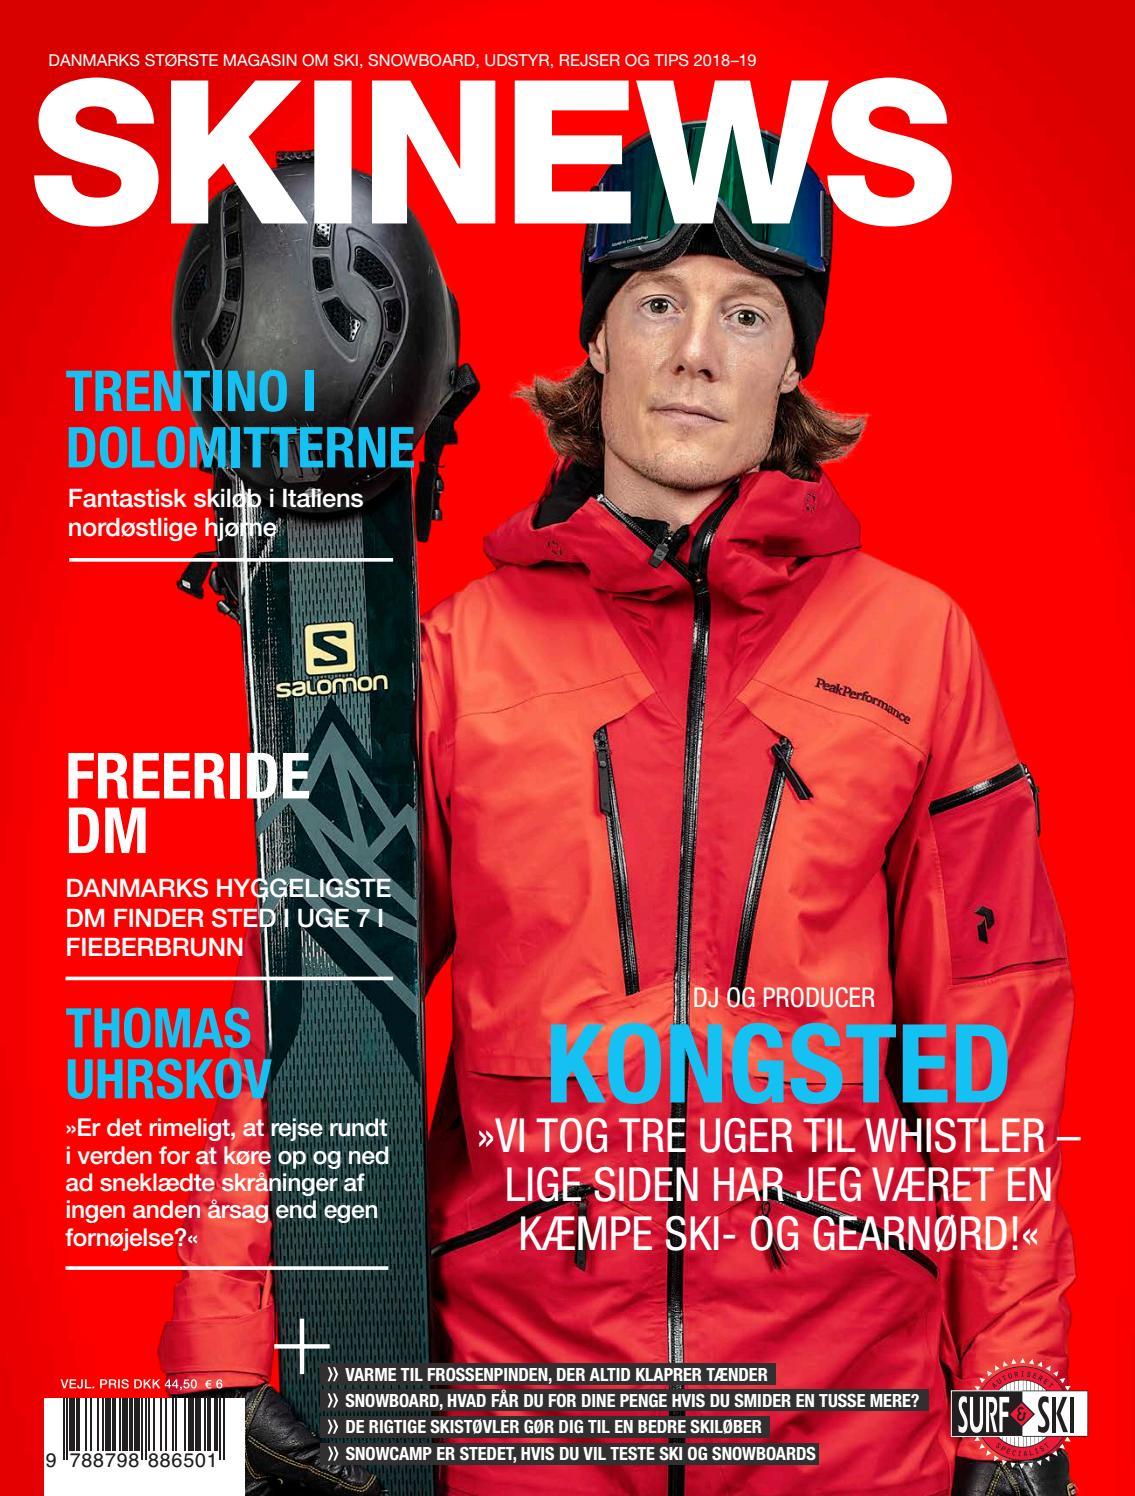 9d9f68b356d5 Skinews 2018-19 by Surf   Ski Danmark - issuu